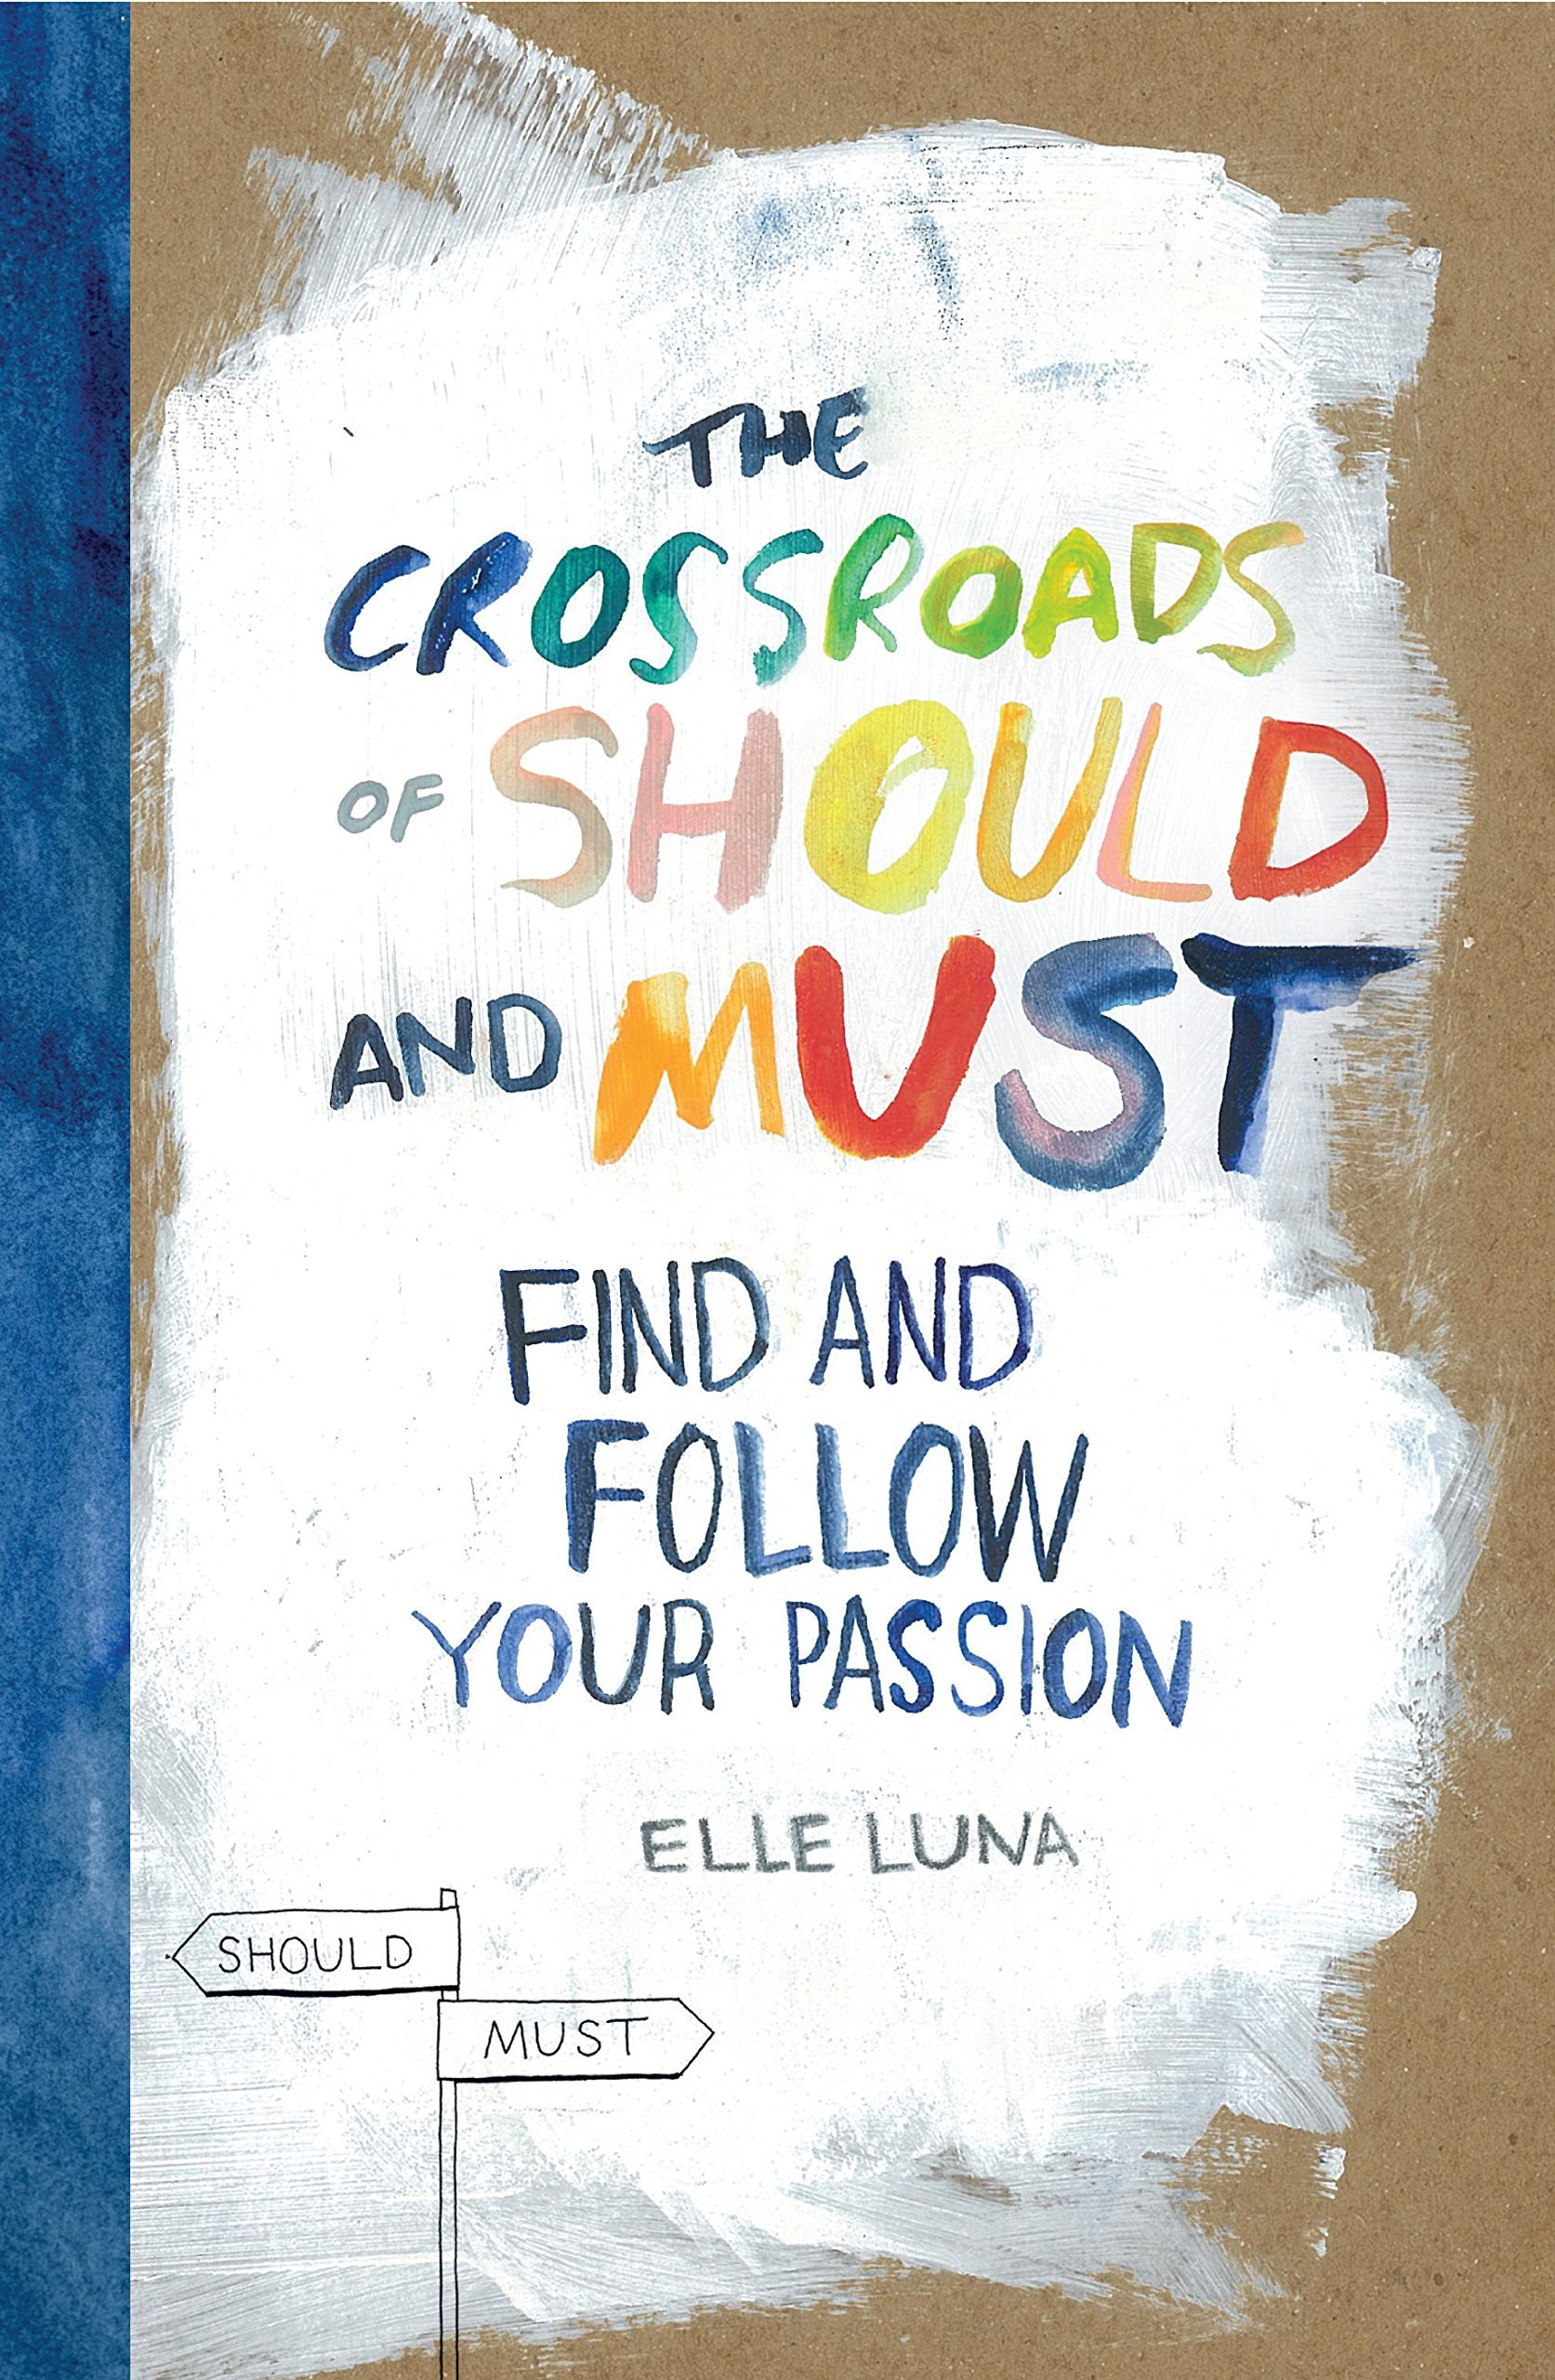 Crossroads of Should & Must